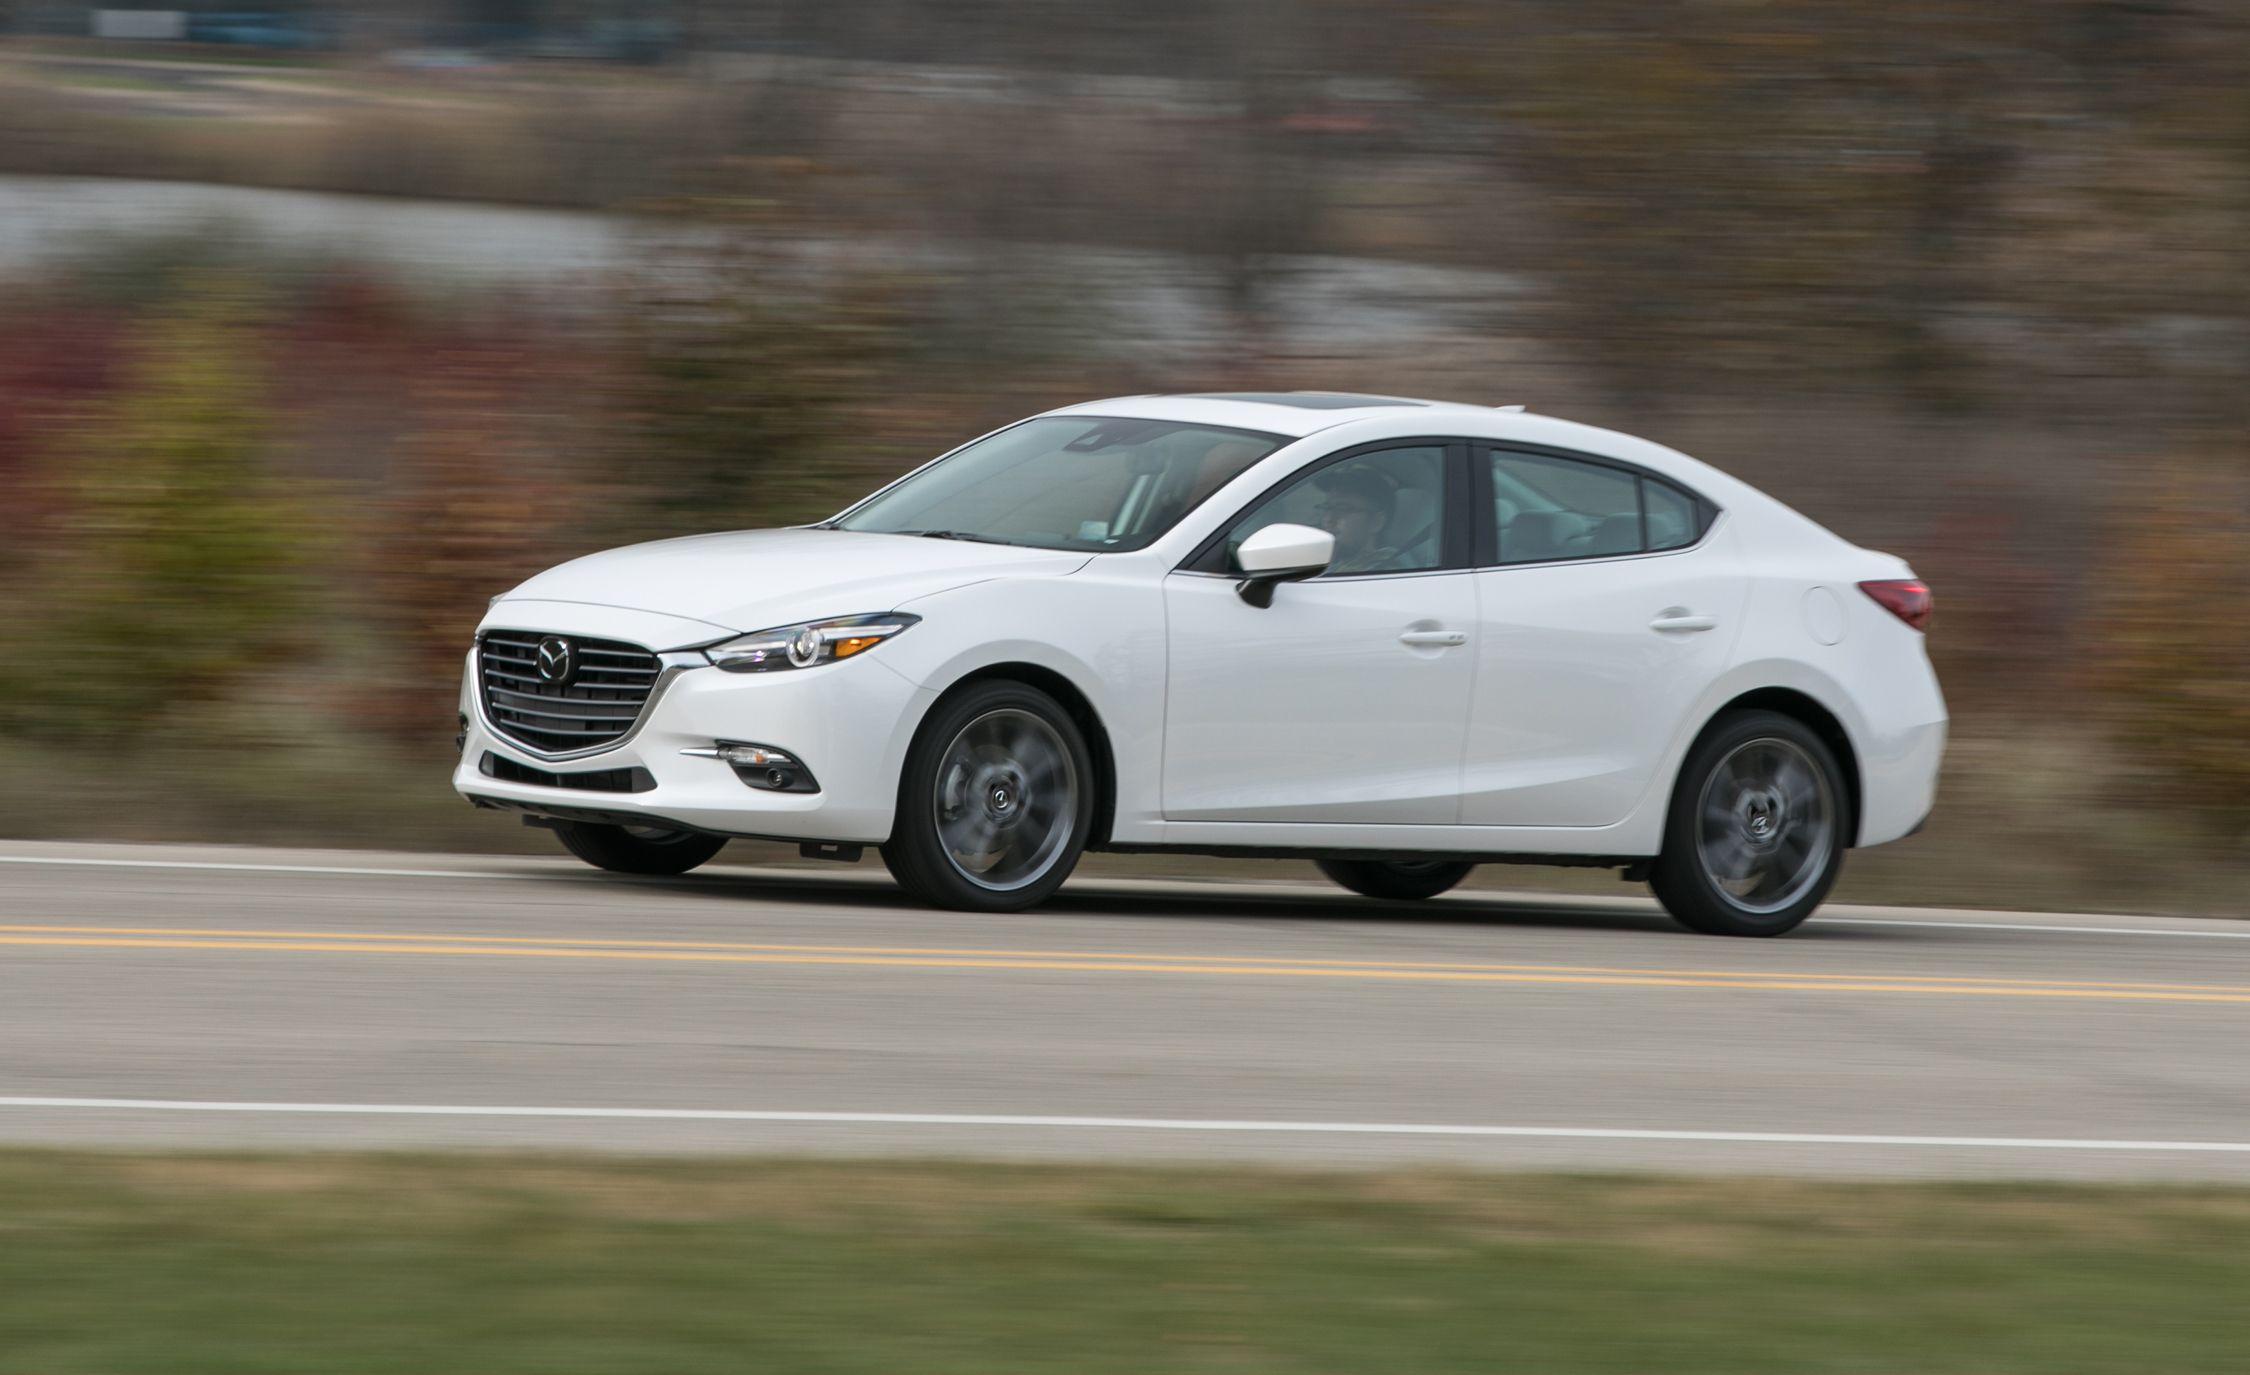 2018 Mazda 3 2.5L Automatic Sedan